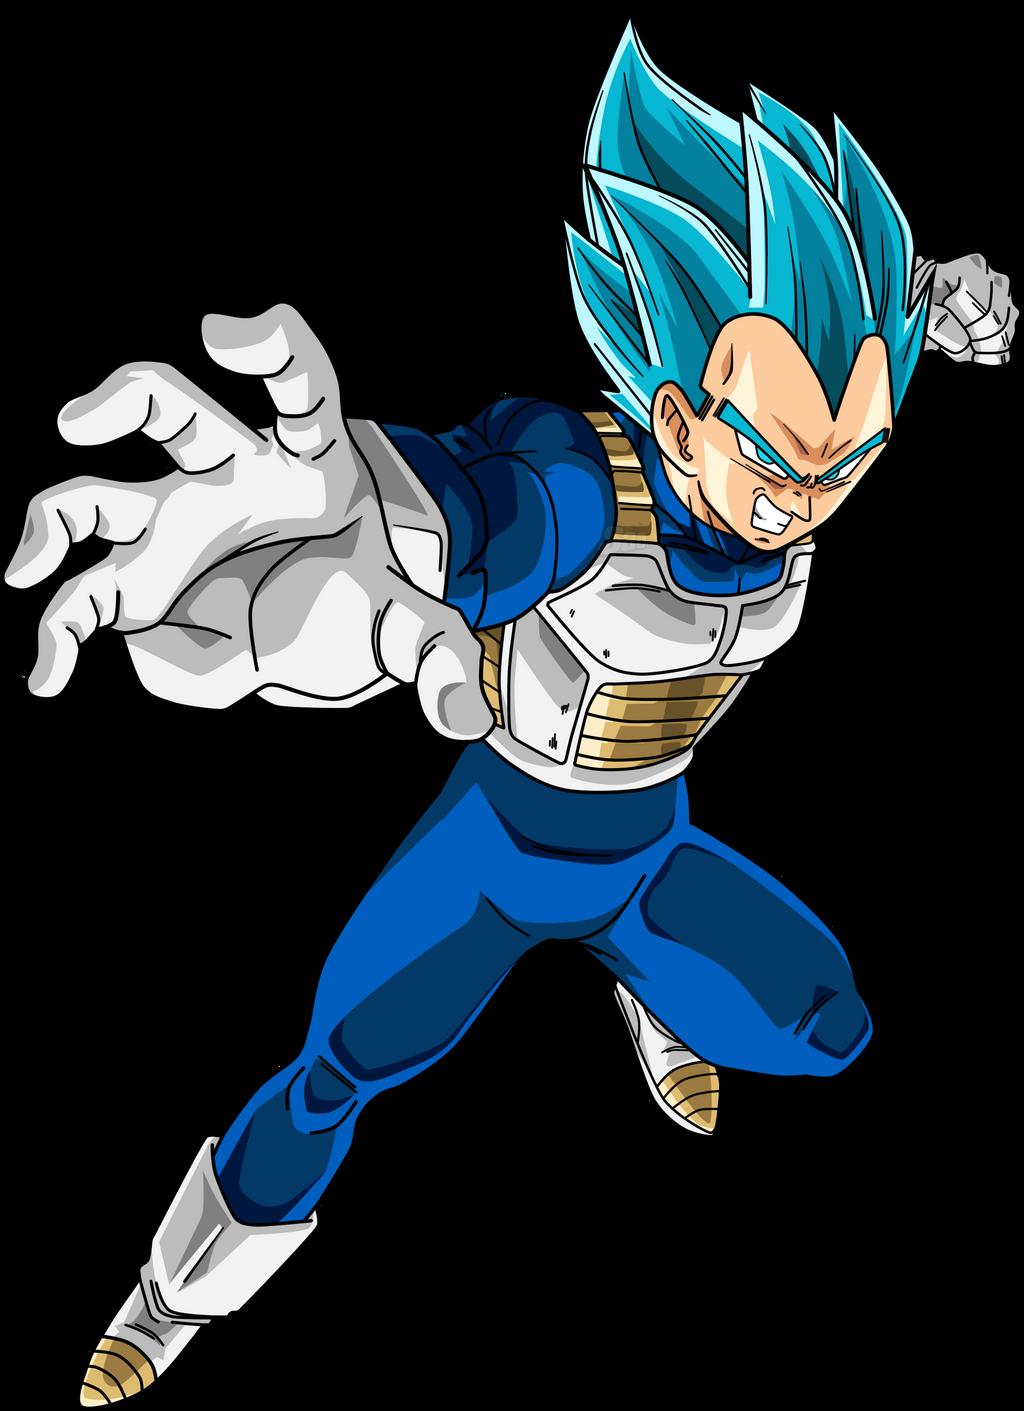 Dragonball super tournament of power set anime official collectoons forums - Vegeta super sayen ...